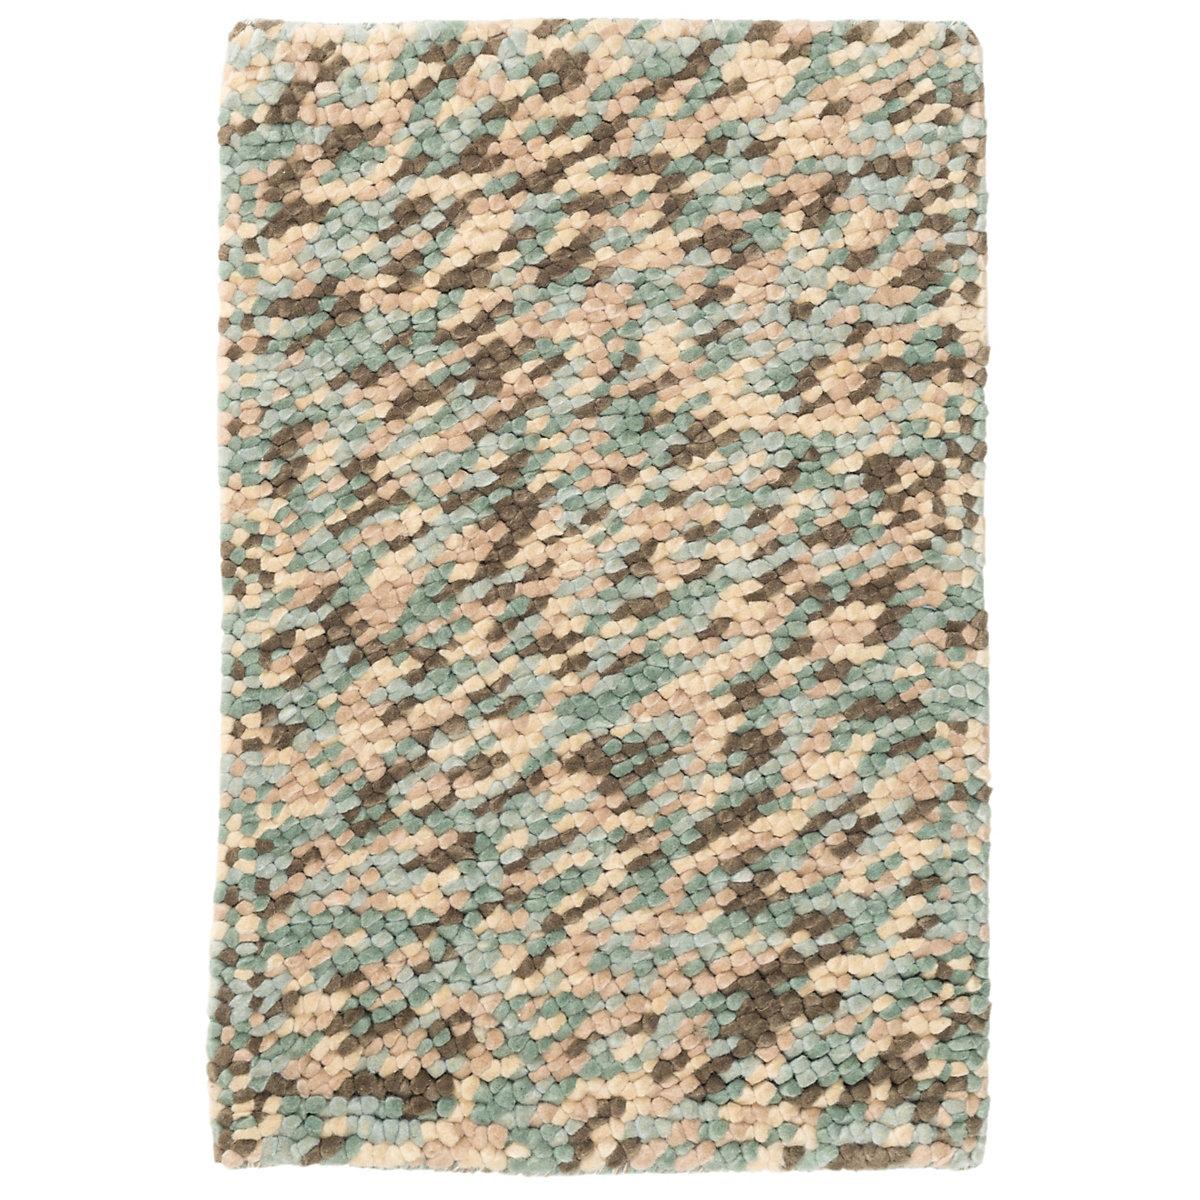 Seurat Seaglass Wool Woven Rug Dash Amp Albert